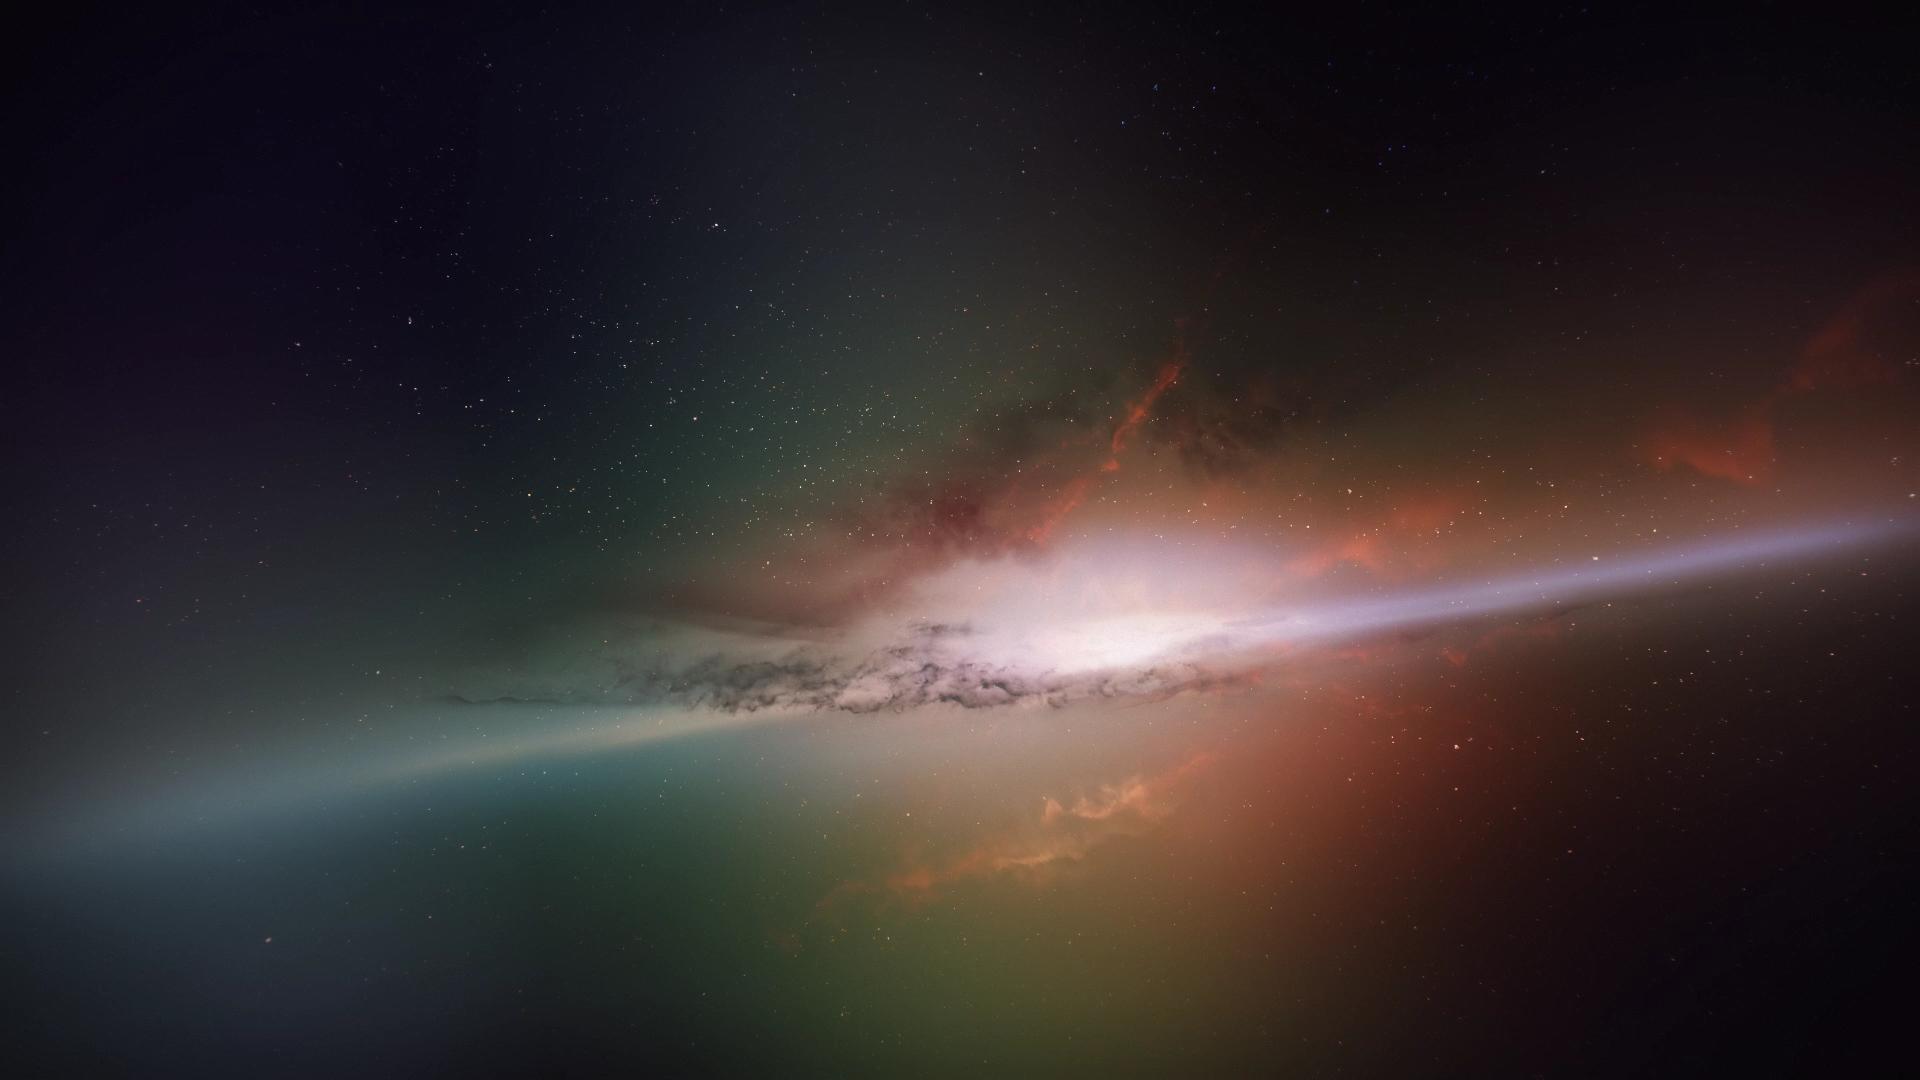 Destiny 2 Backgrounds are just amazing destiny2 1920x1080